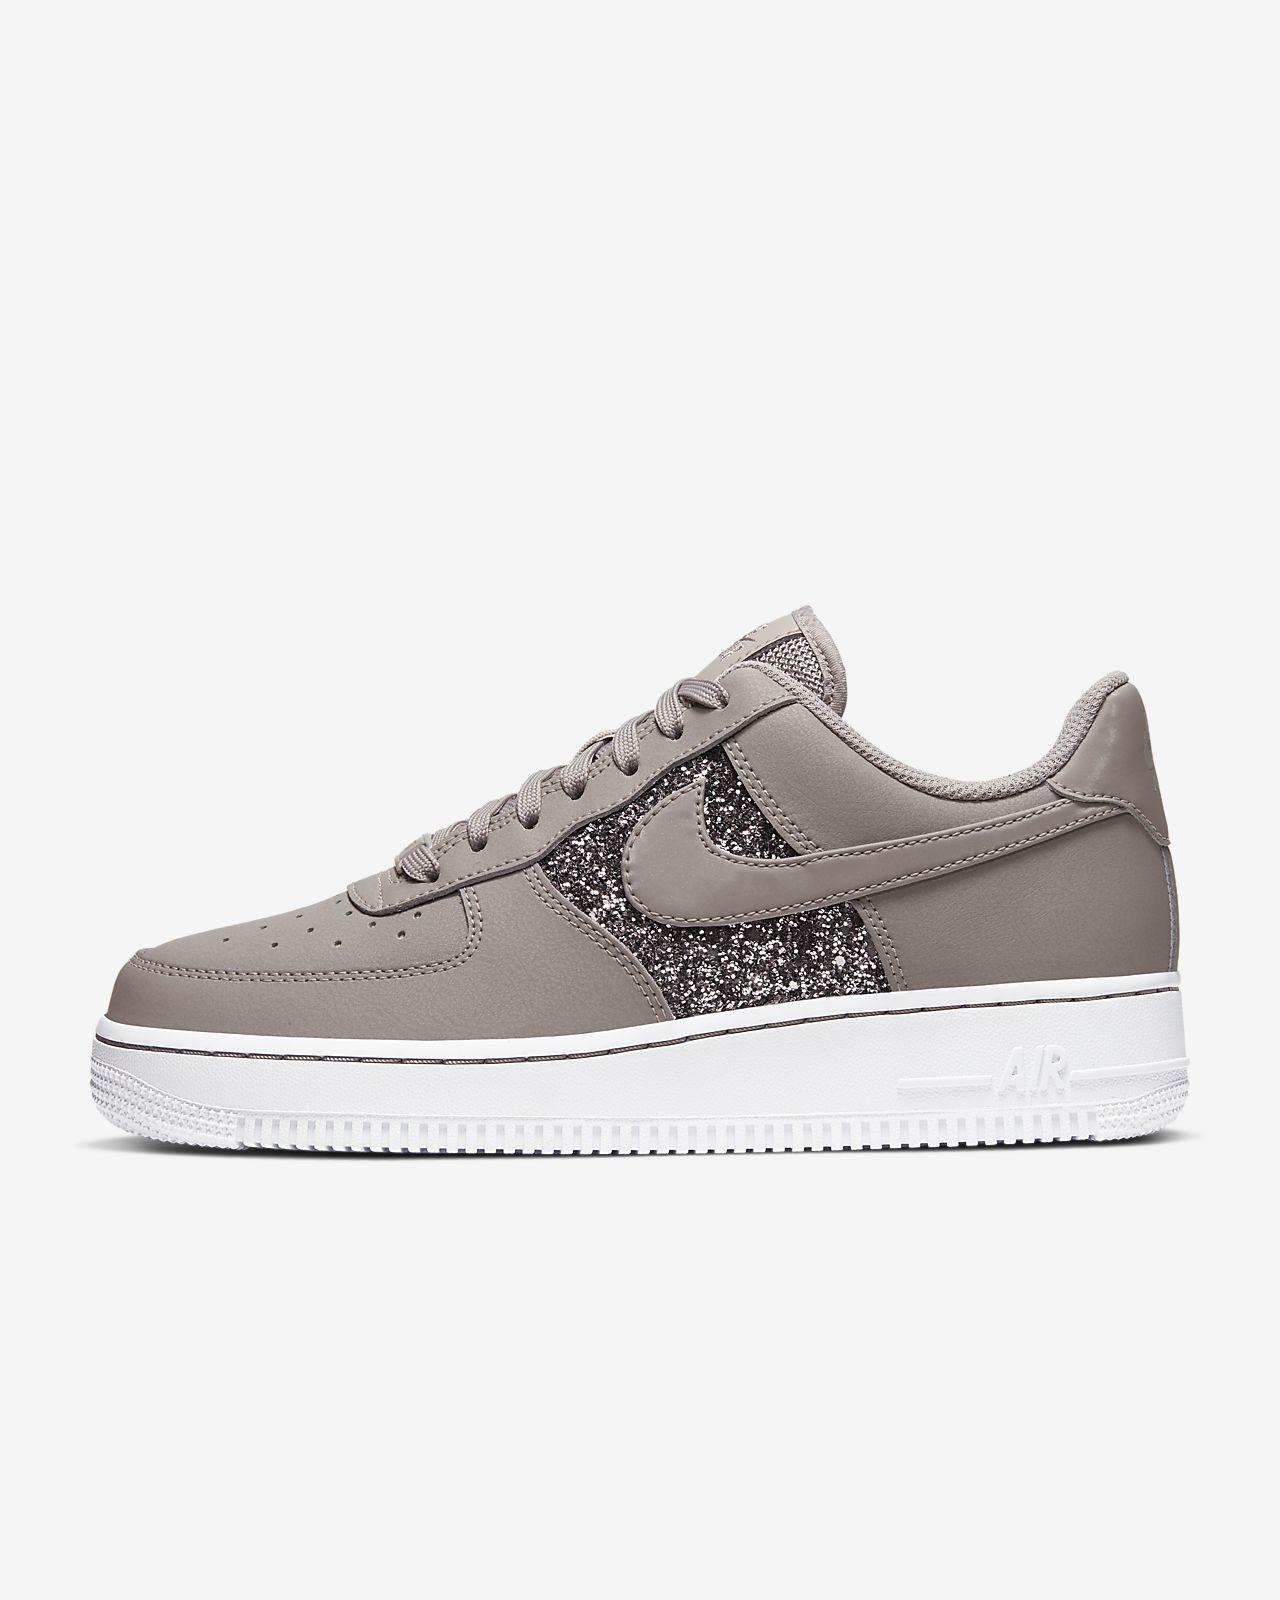 Nike Air Force 1 Low Zapatillas brillantes - Mujer